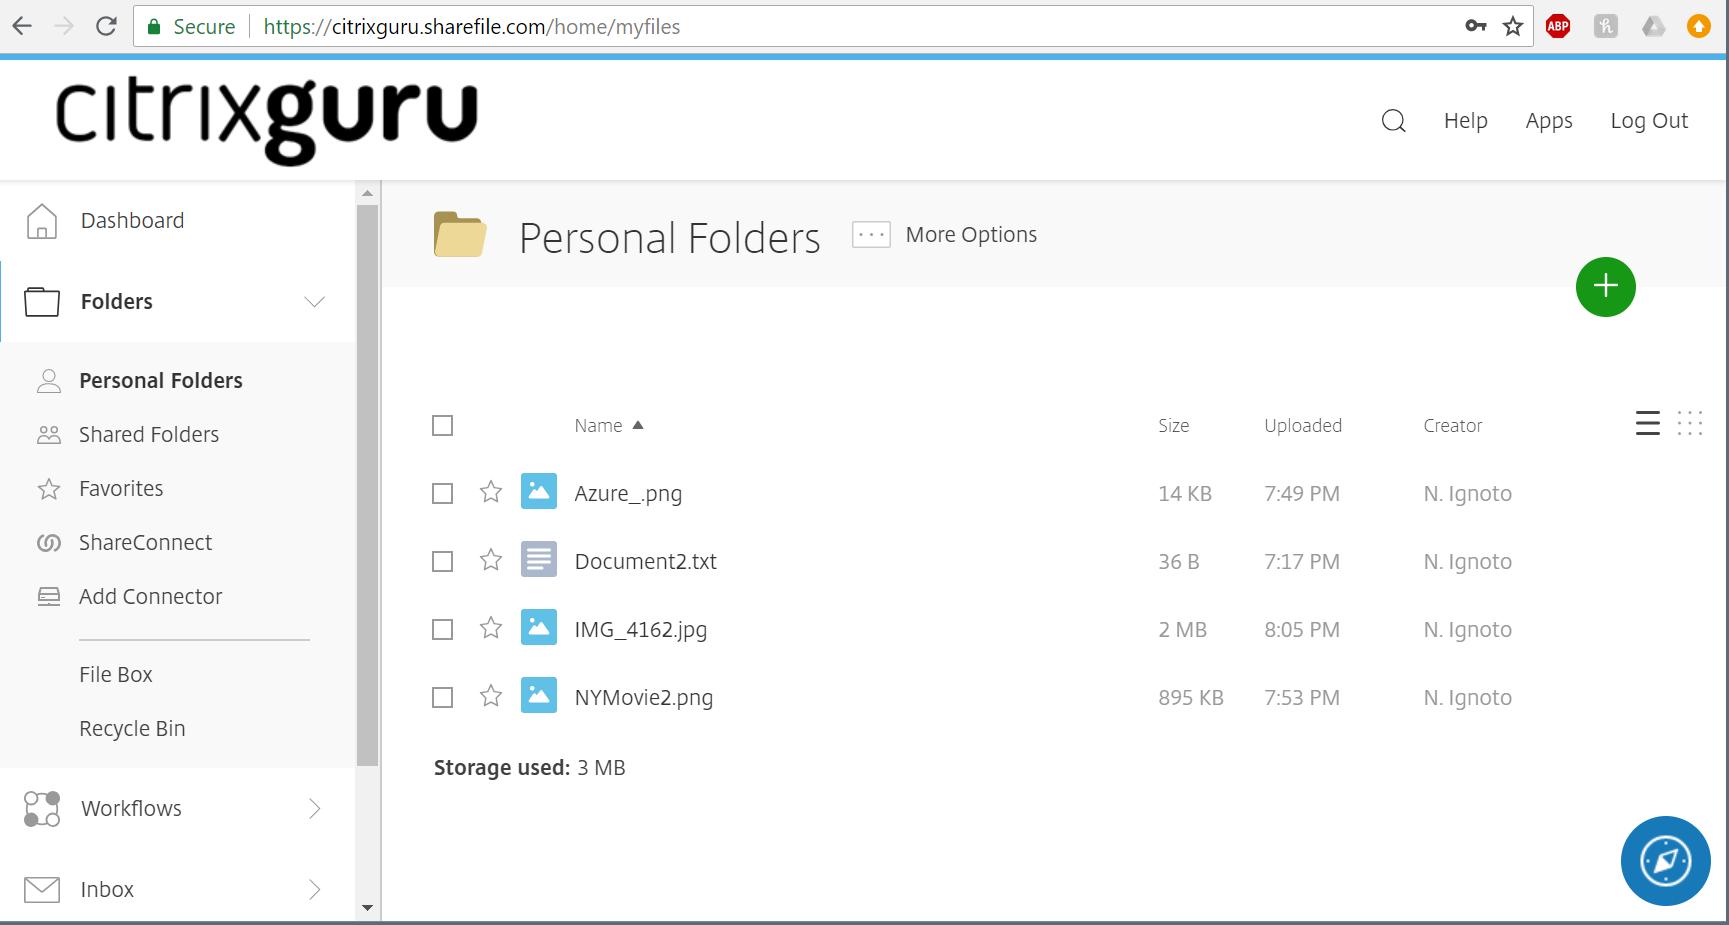 ShareFile Web App